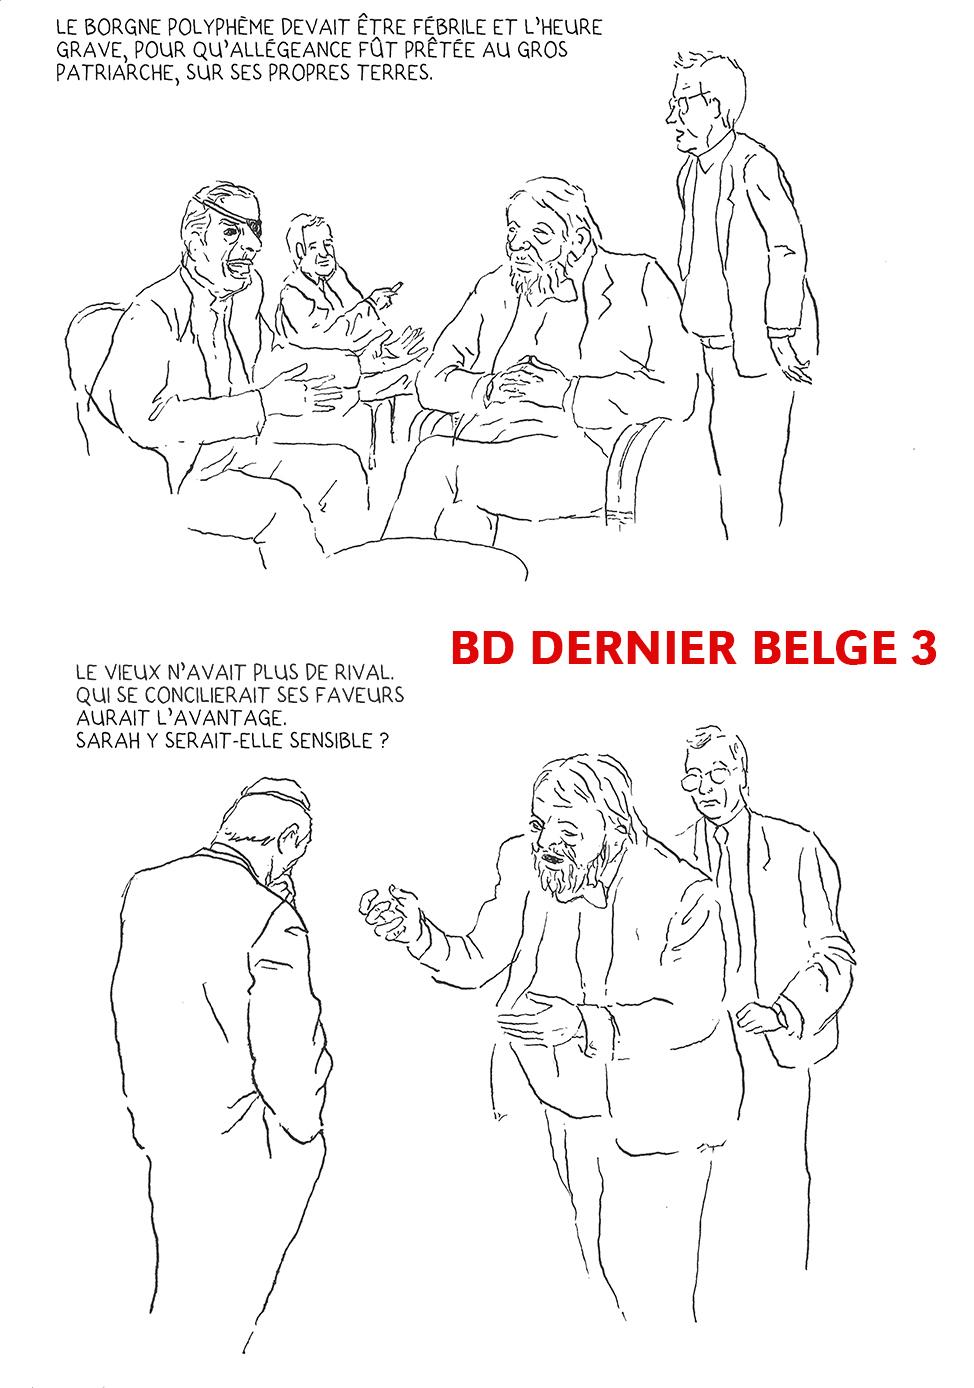 bd_dernier belge_3